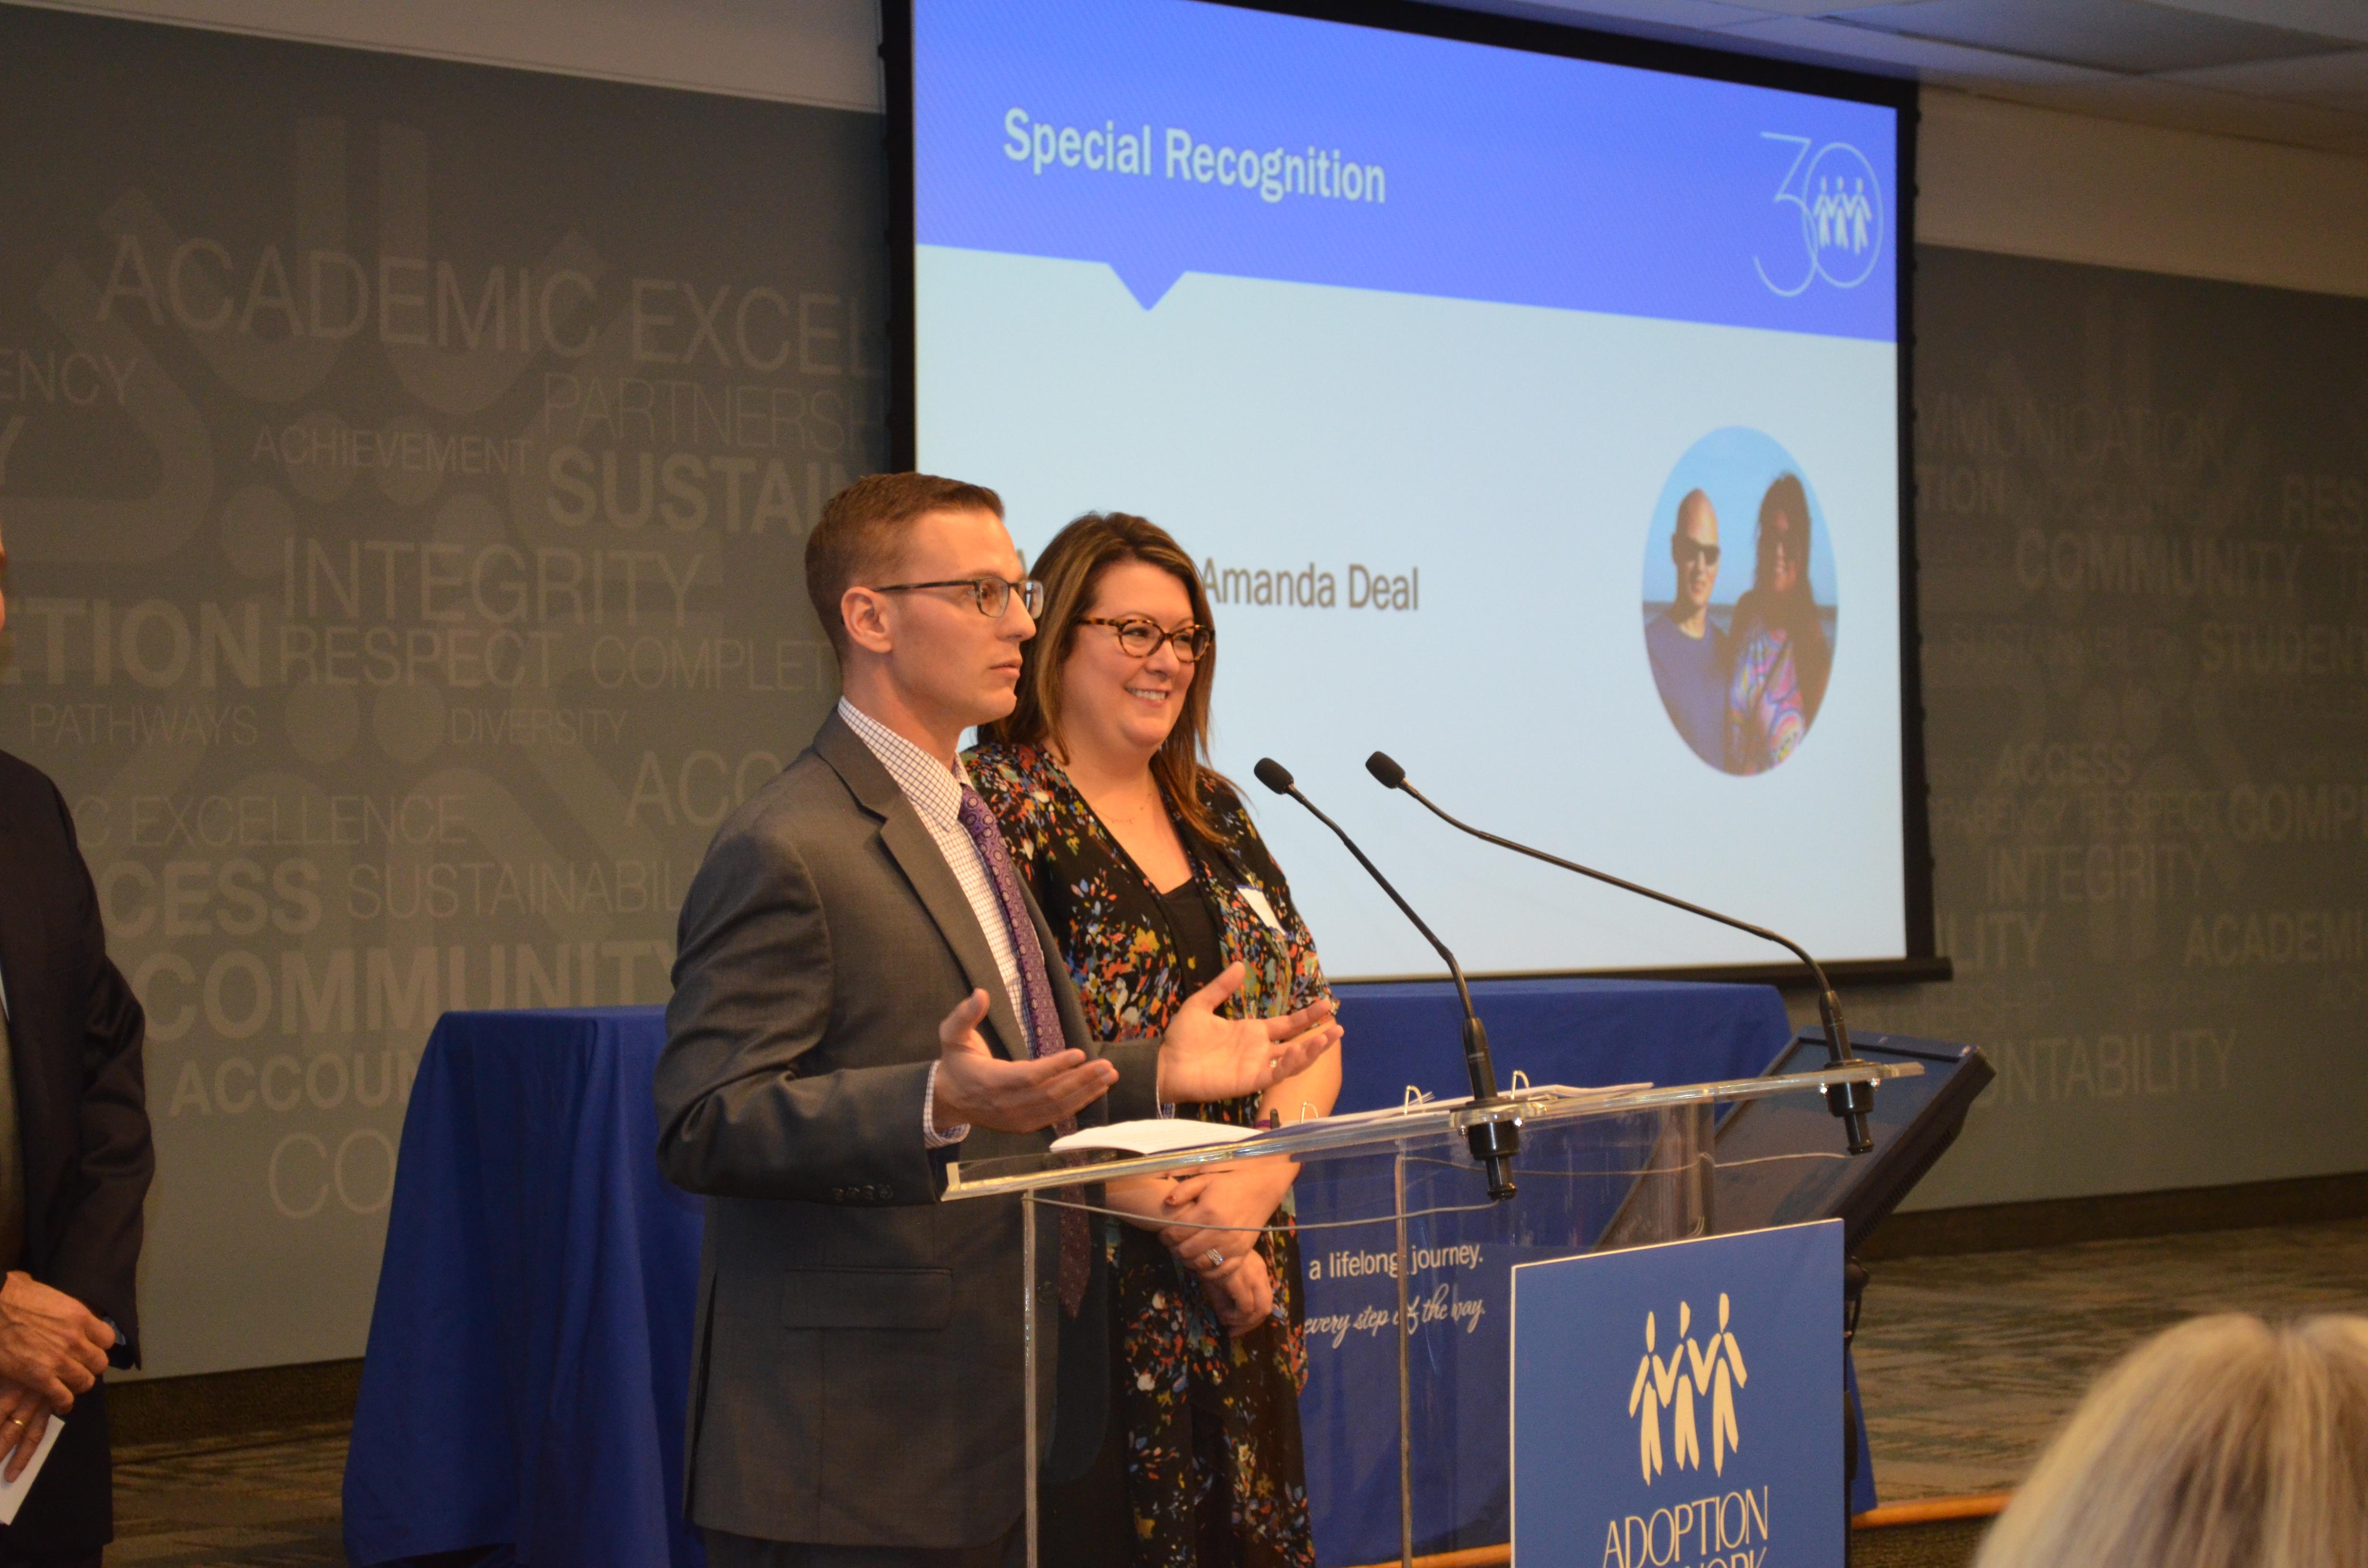 Adoptive Parents Receive Special Recognition Award